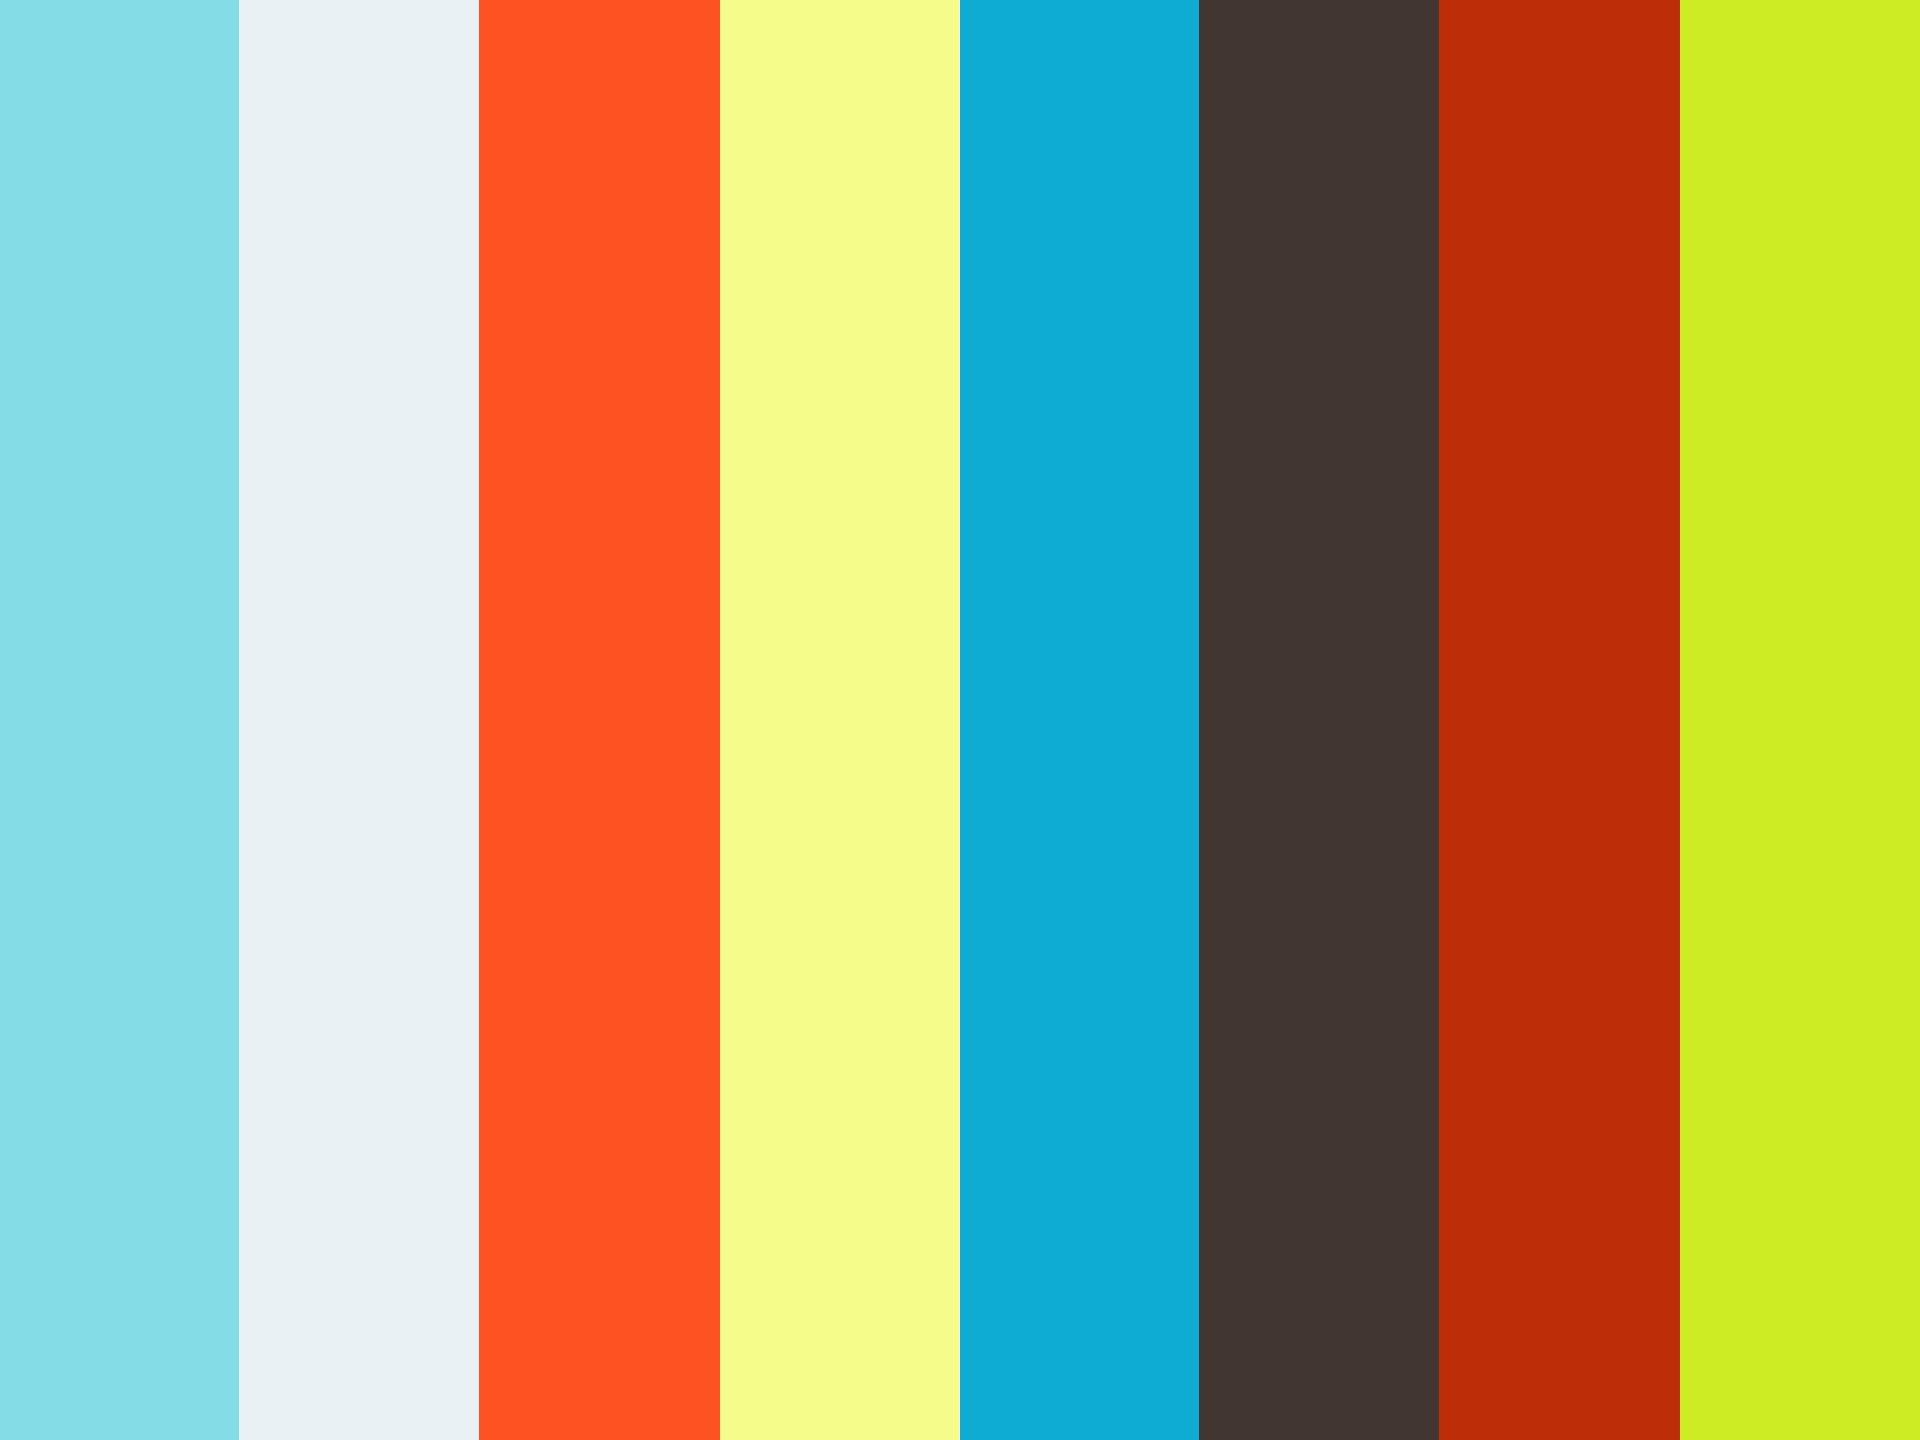 Overlay Src Https A F Fi Vimeocdn Com Fvideo F X Jpg Amp Src Https A F Ff Vimeocdn Com Fimages V Fshare Fplay Icon Overlay on Suzuki Xl7 Timing Chain Diagram